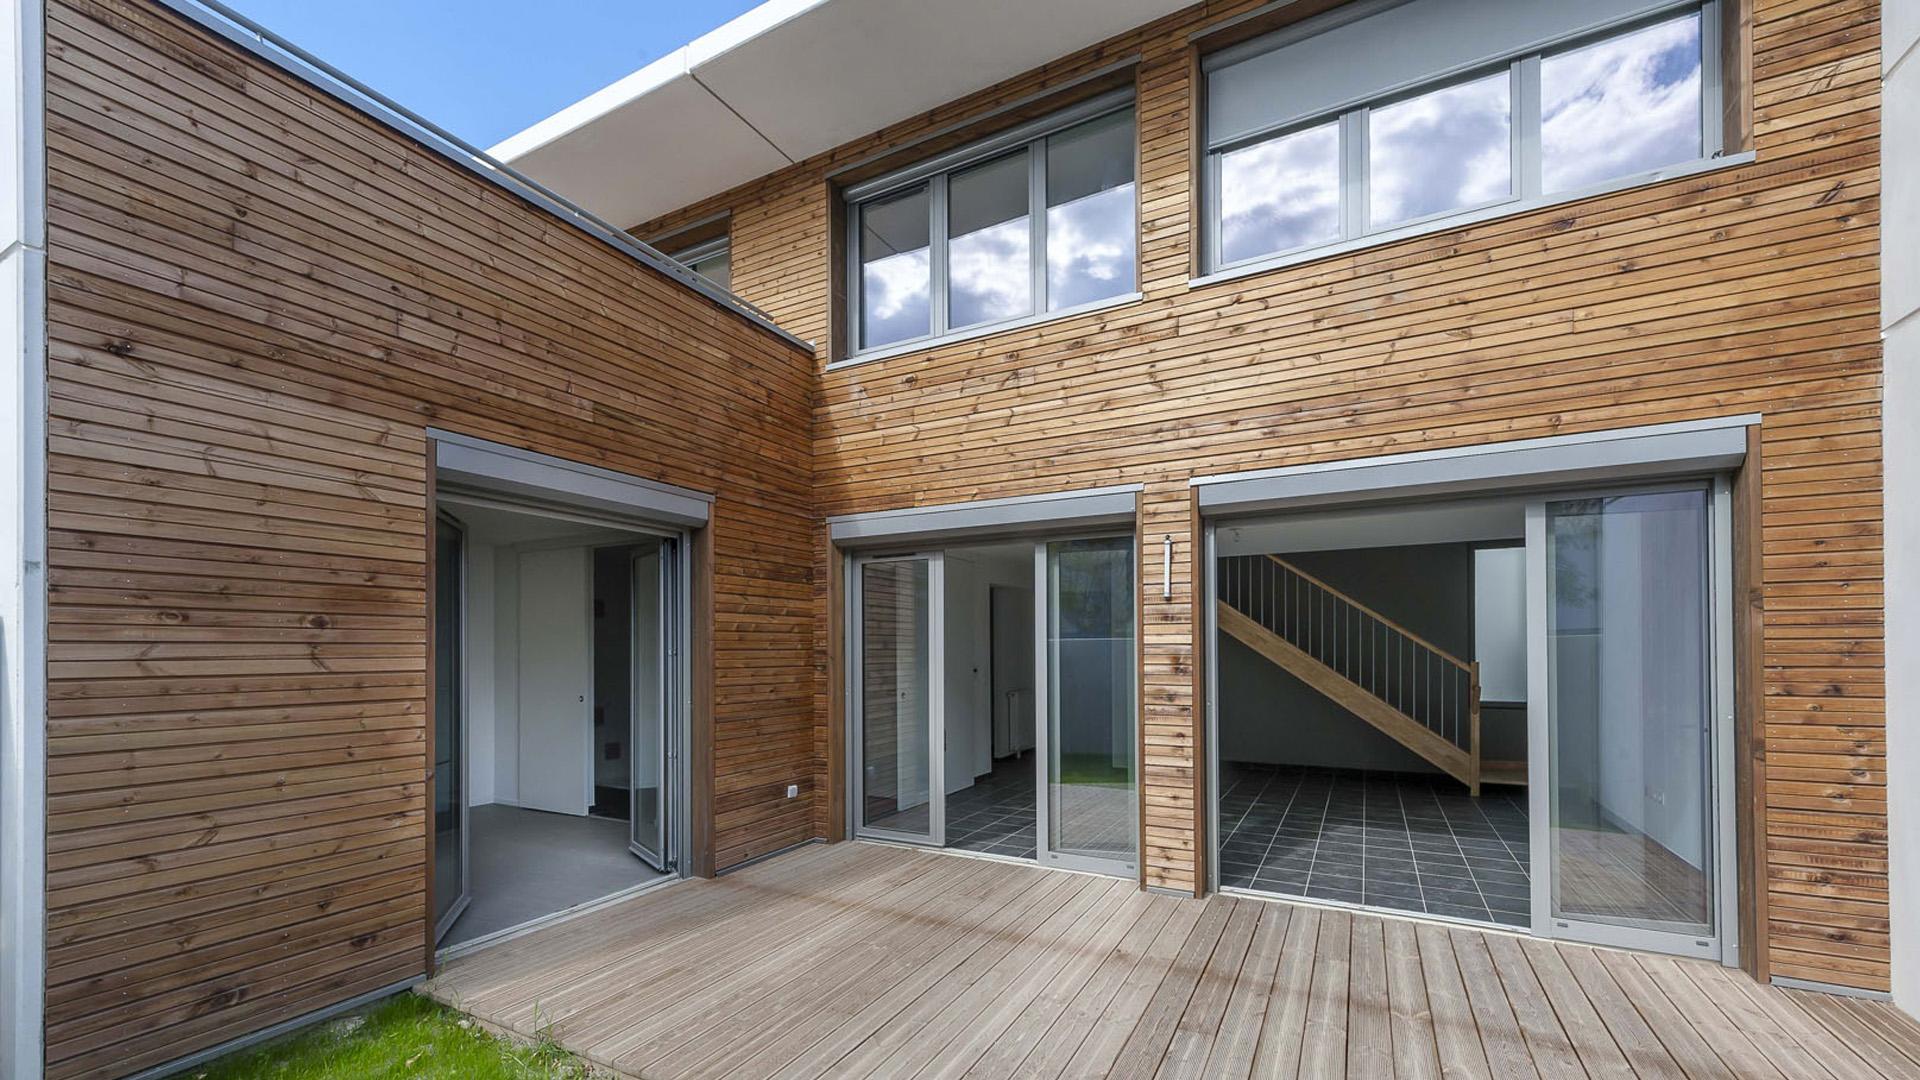 Seuil-architecture-Canavera-ICF-photo-S.Brugidou-06